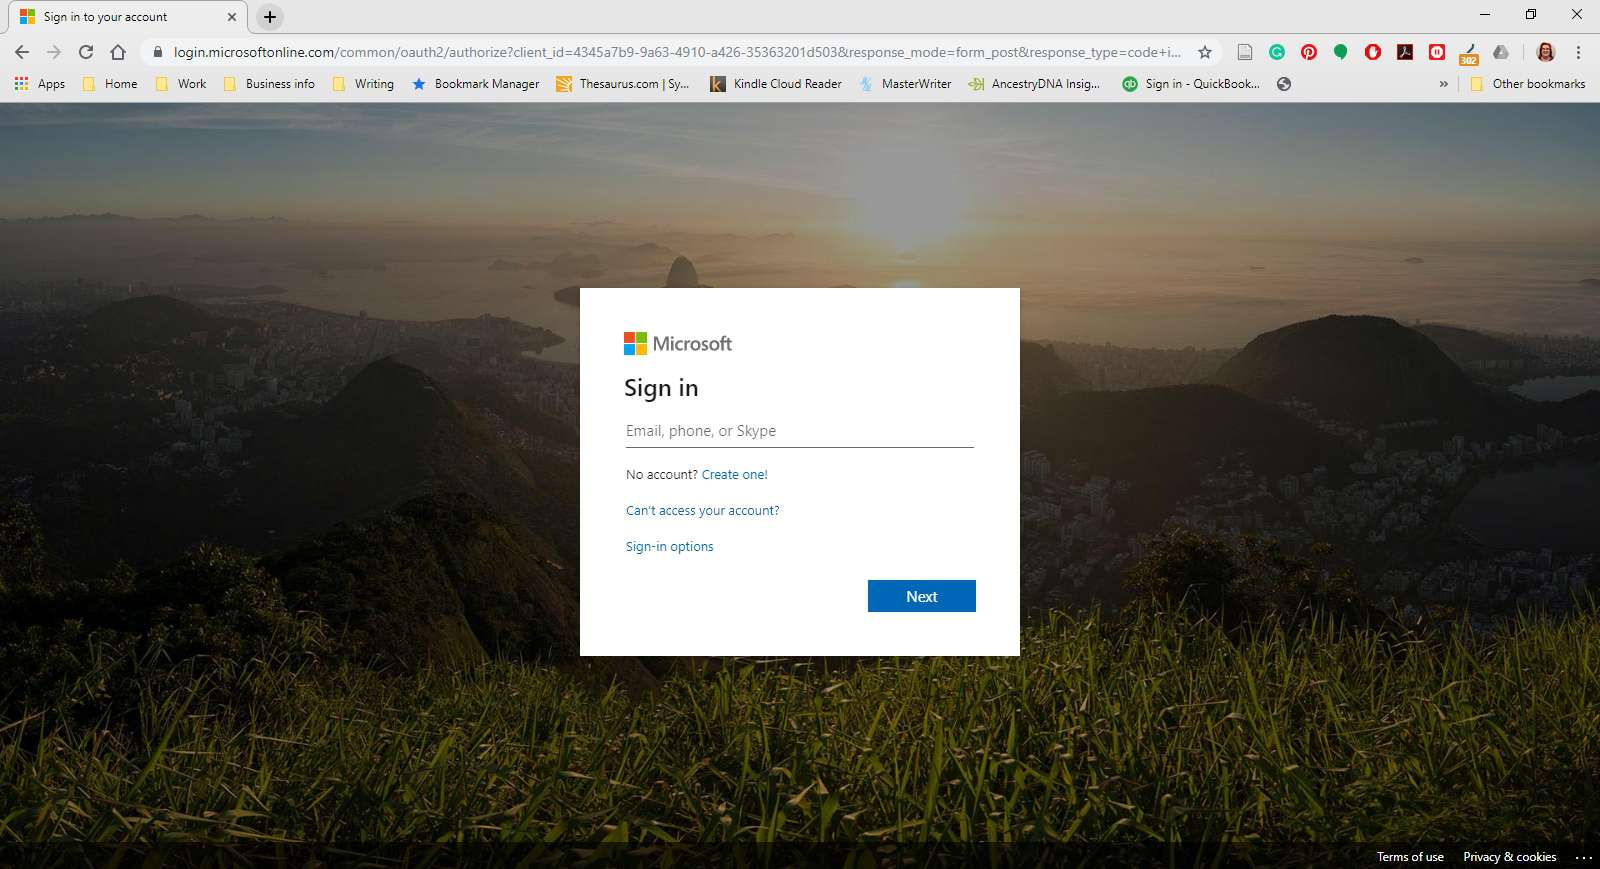 Microsoft Office login website.